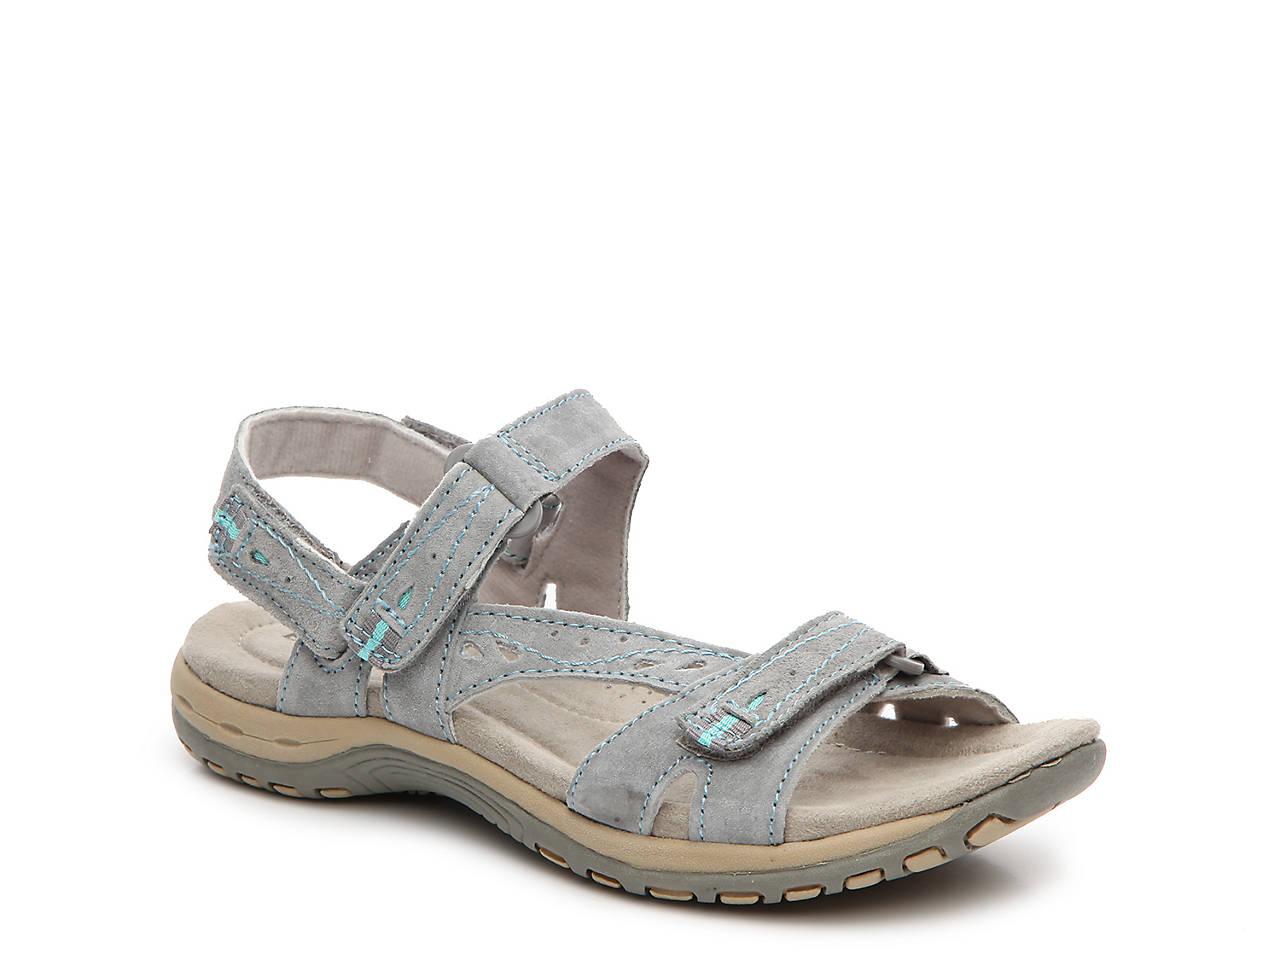 4036fc52523 Earth Origins Sophie Sport Sandal Women s Shoes